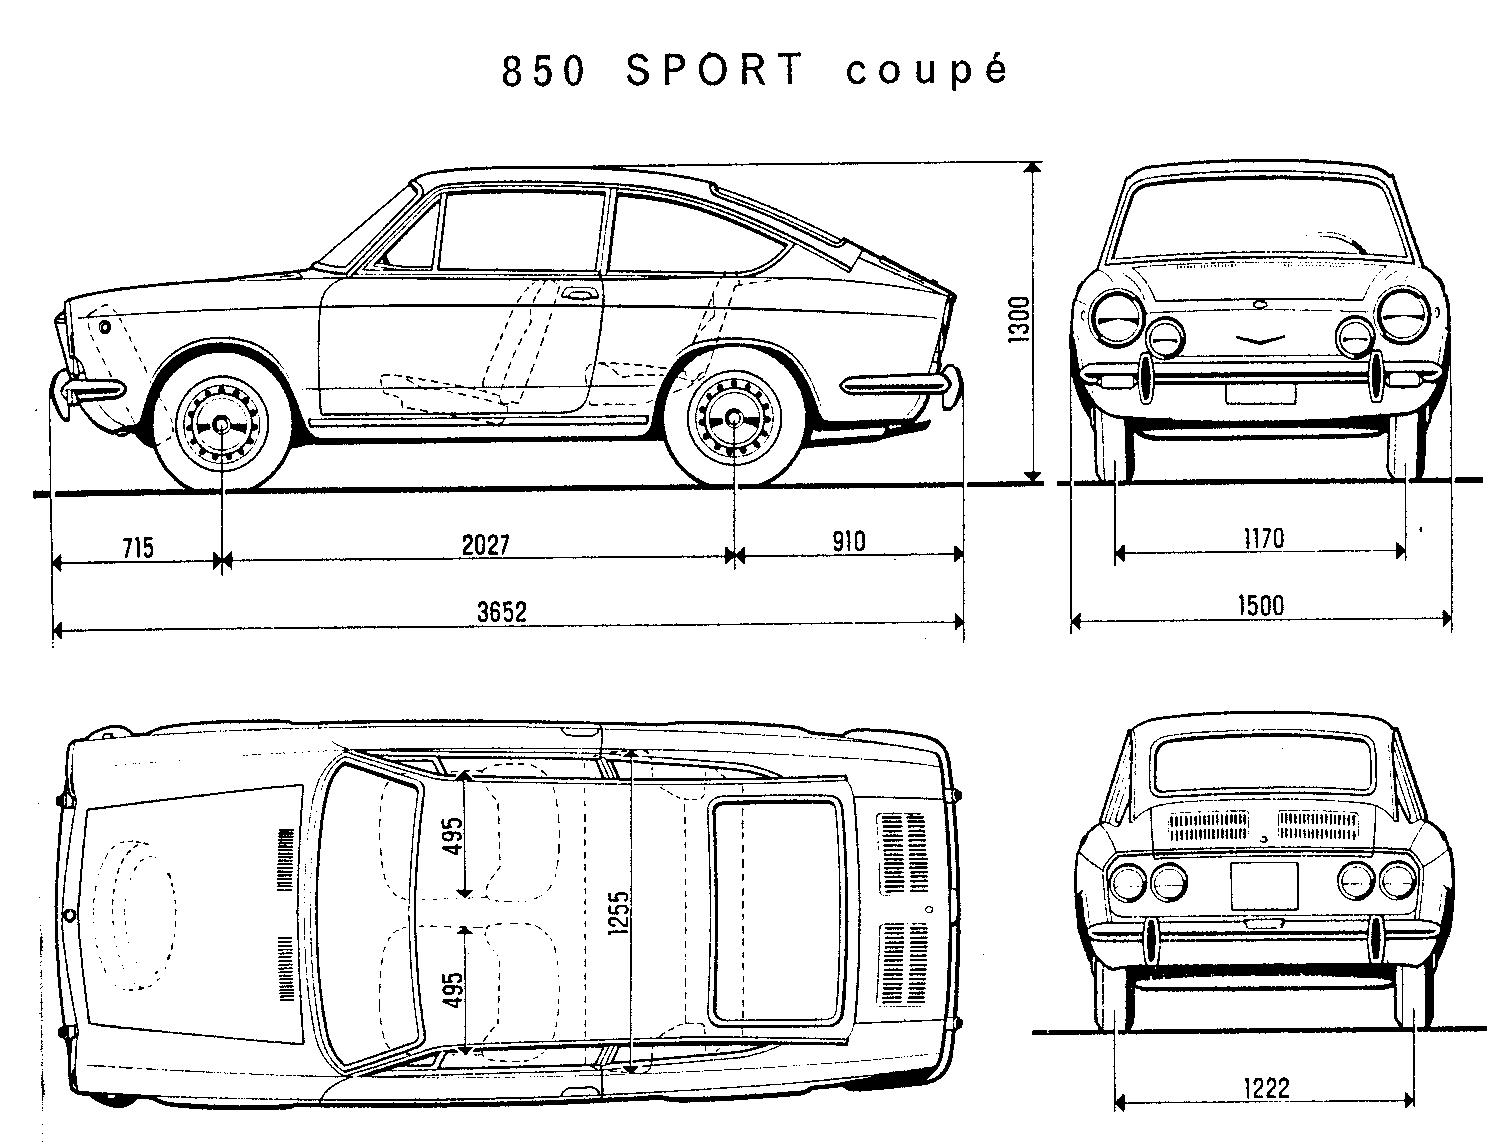 Seat 850 blueprint